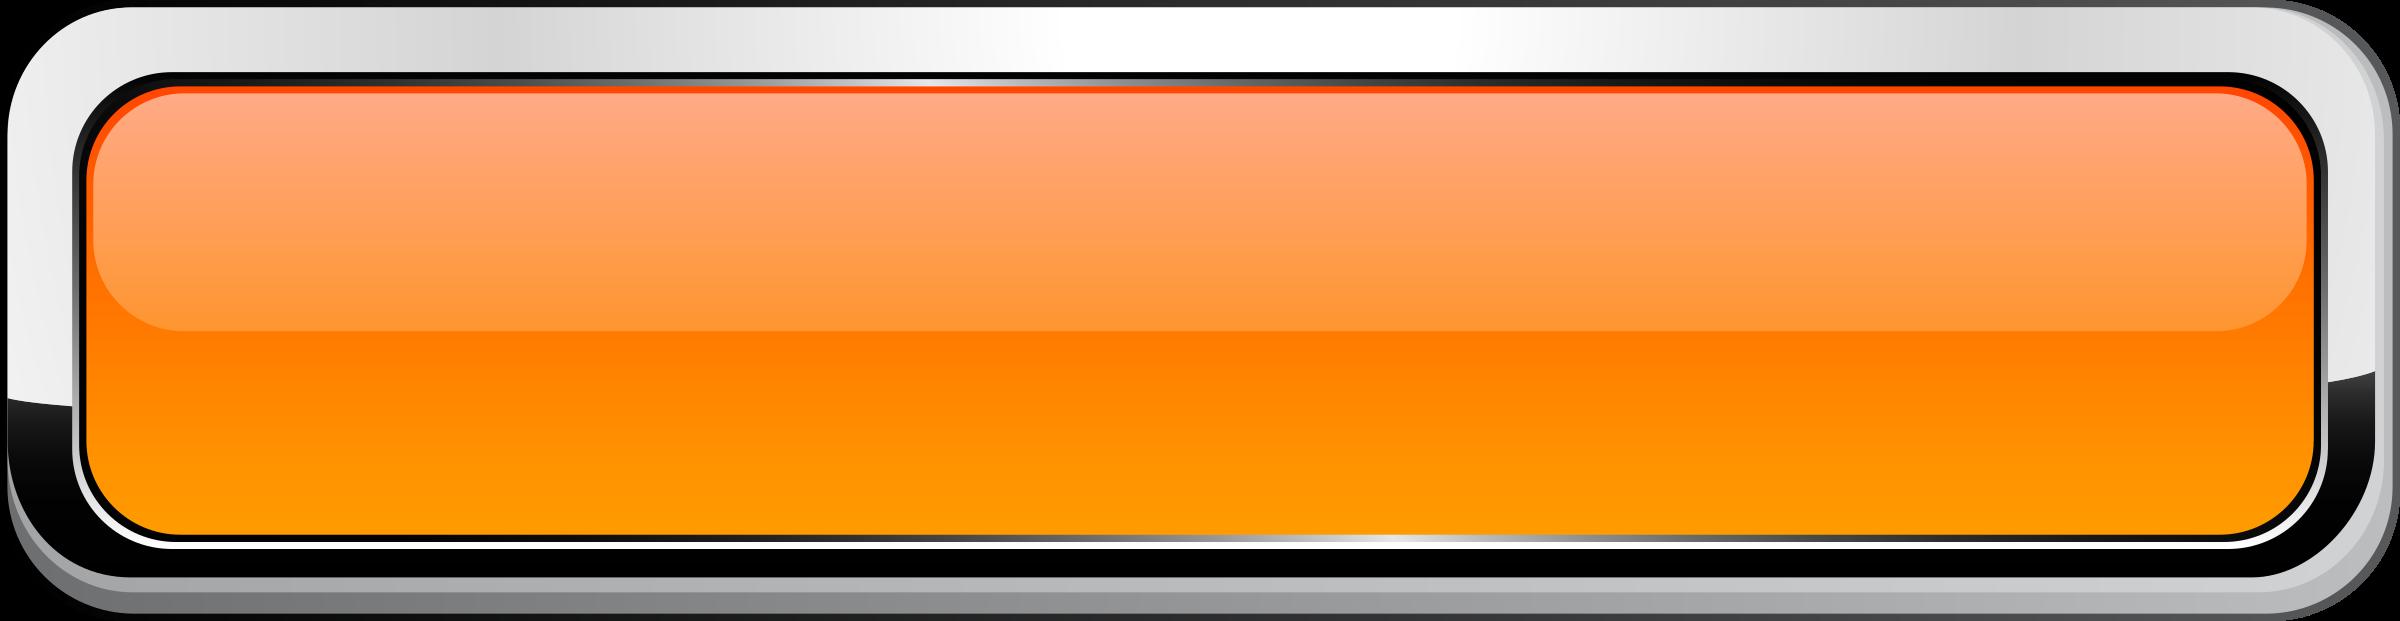 Button clipart orange button. Square big image png